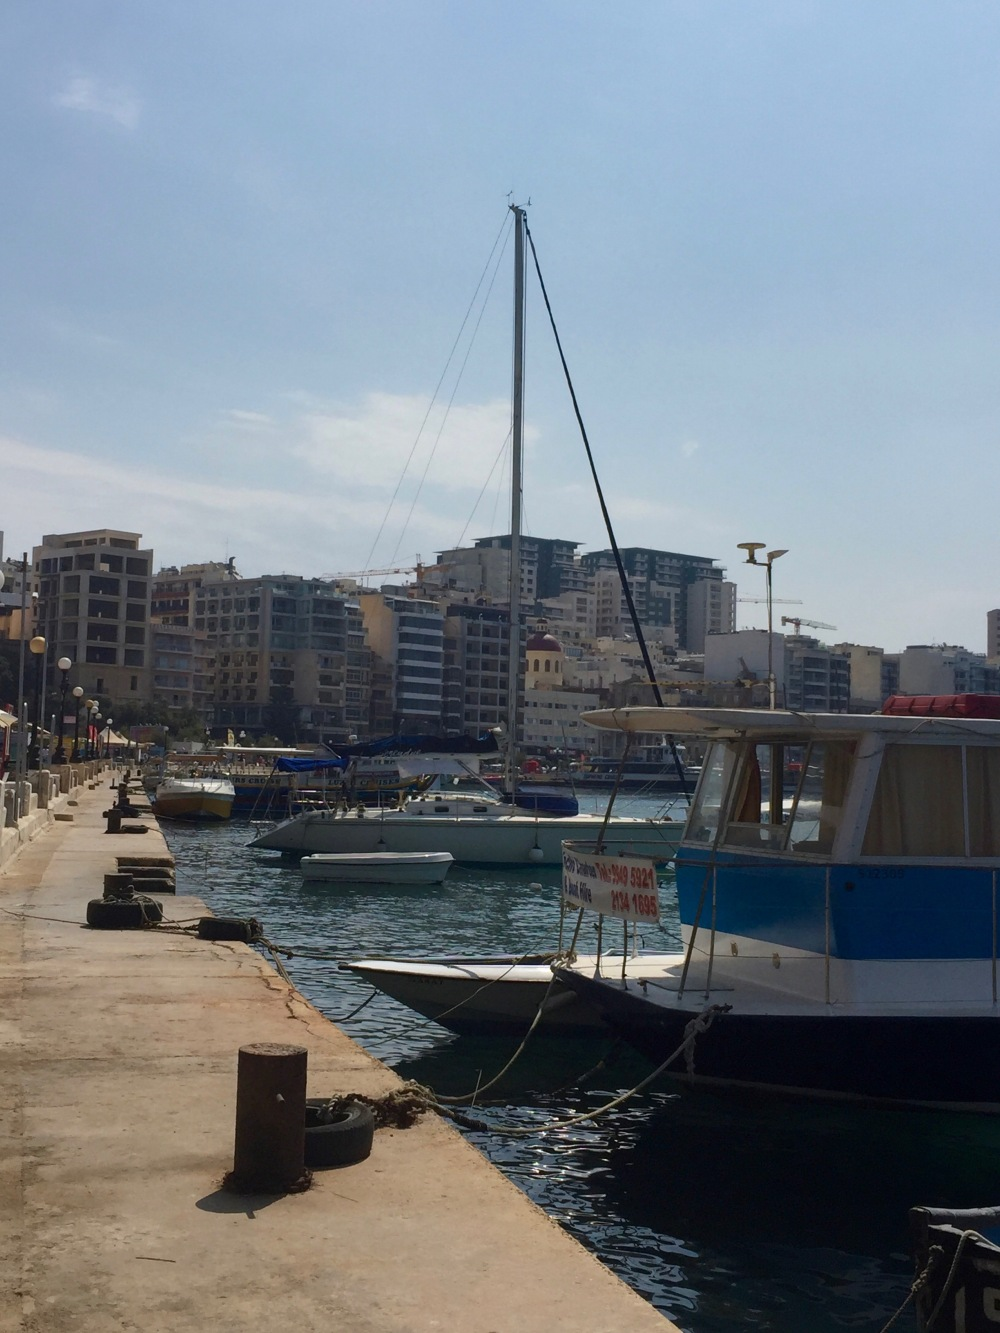 Seaside ports